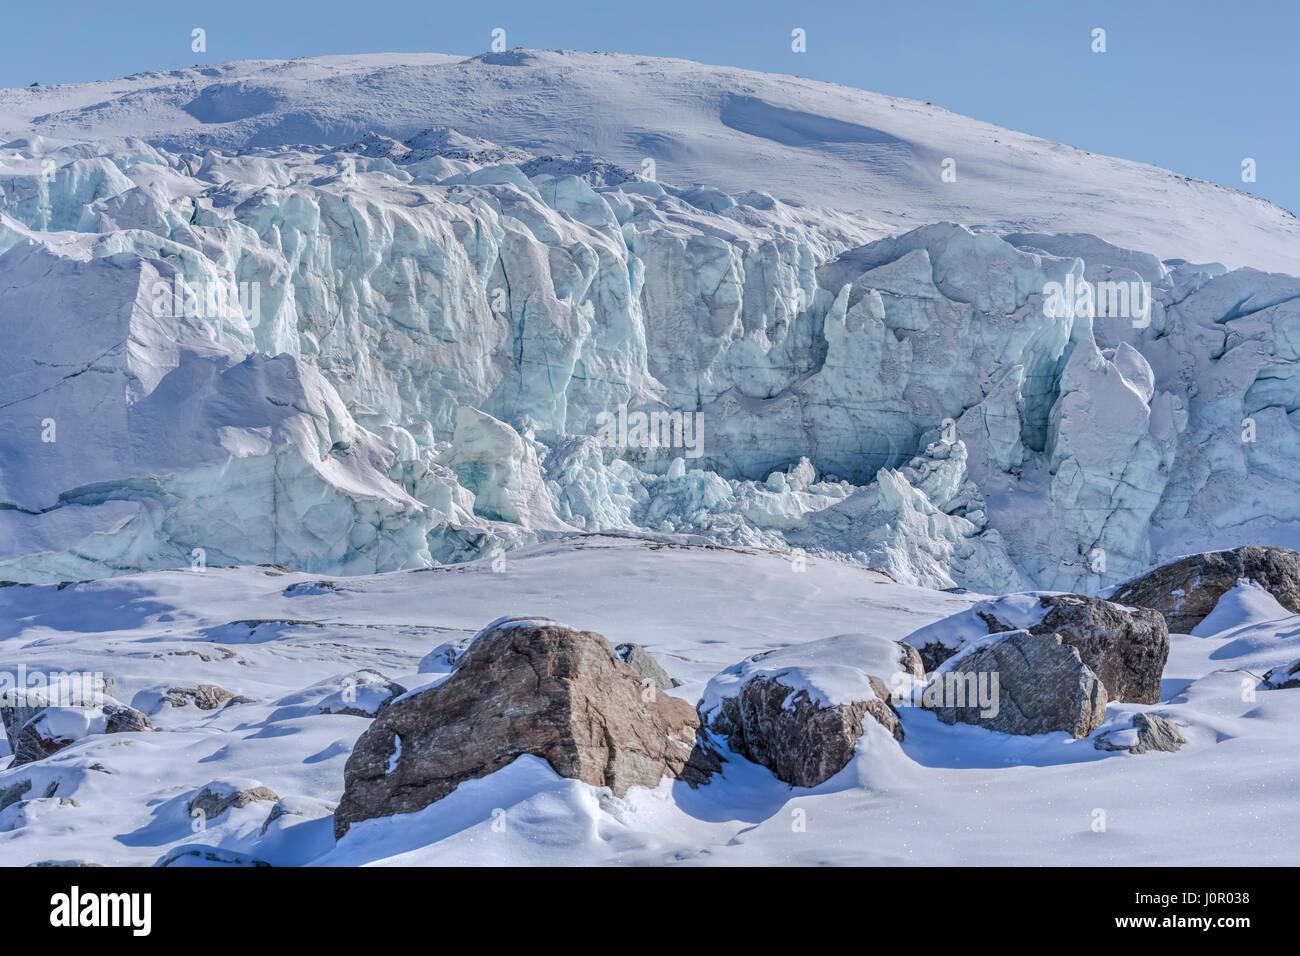 Russell Glacier, Kangerlussuaq, Artic Circle, Greenland, Europe - Stock Image